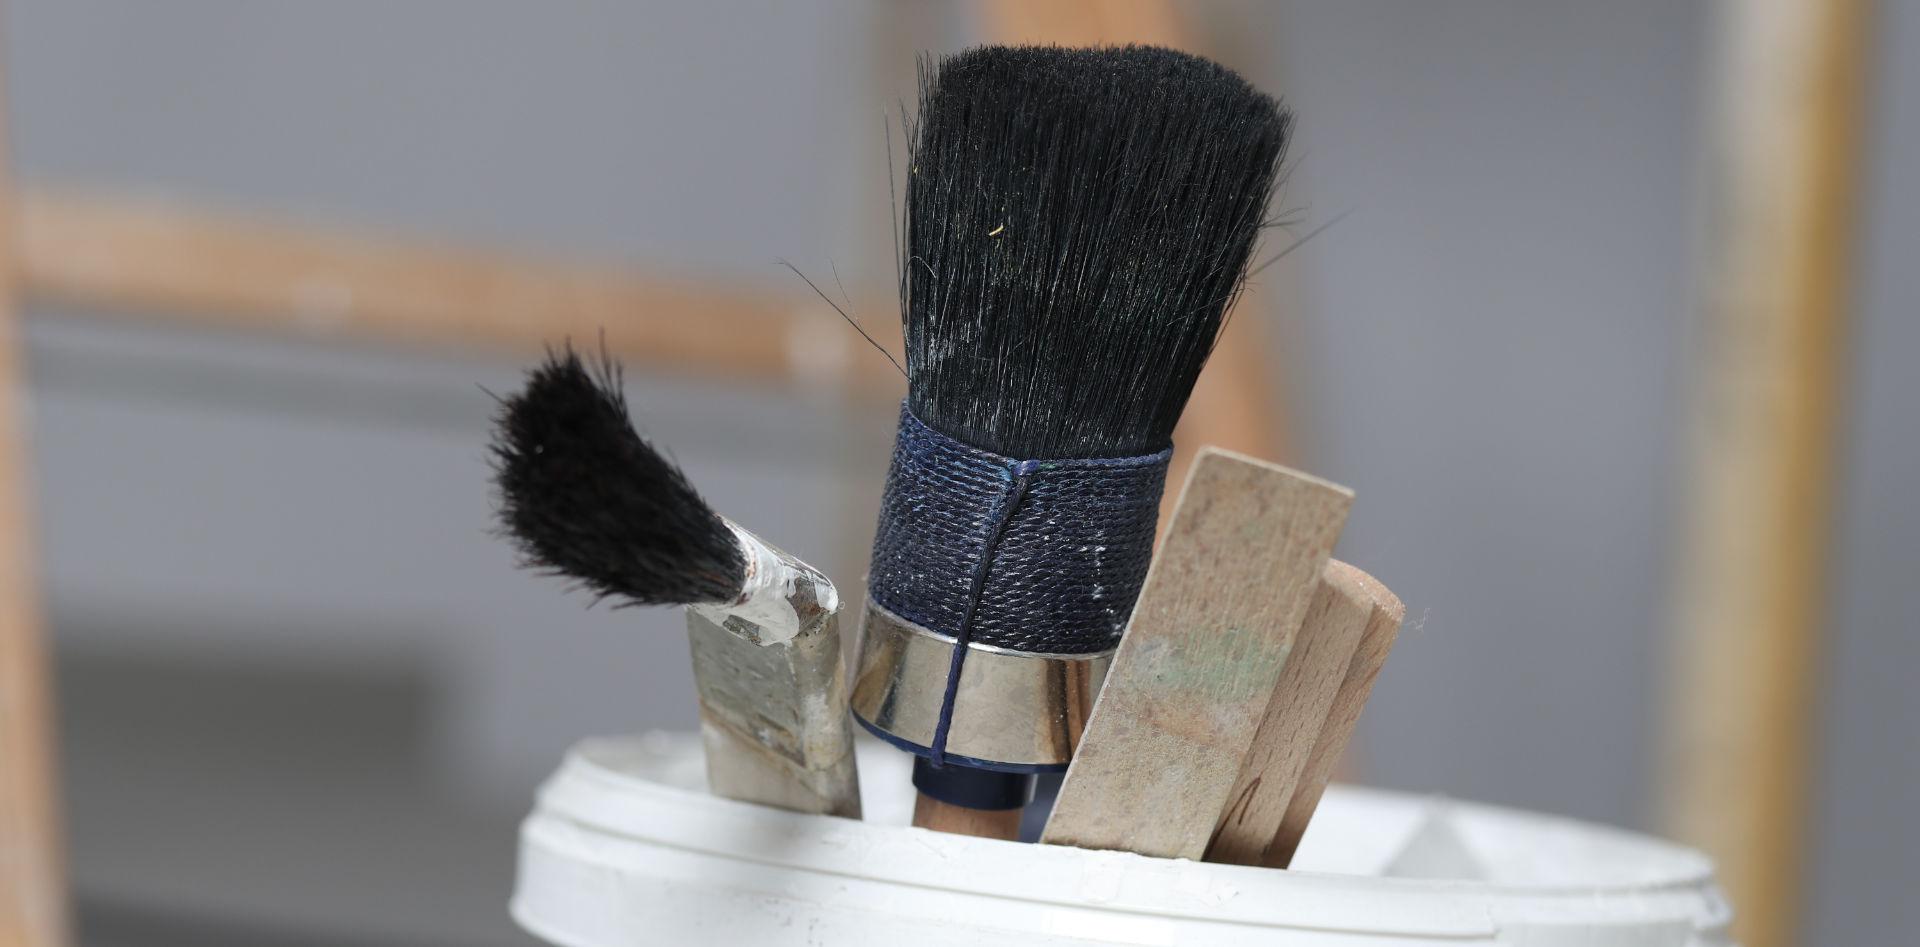 DAHMS Malereibetrieb - Pinsel